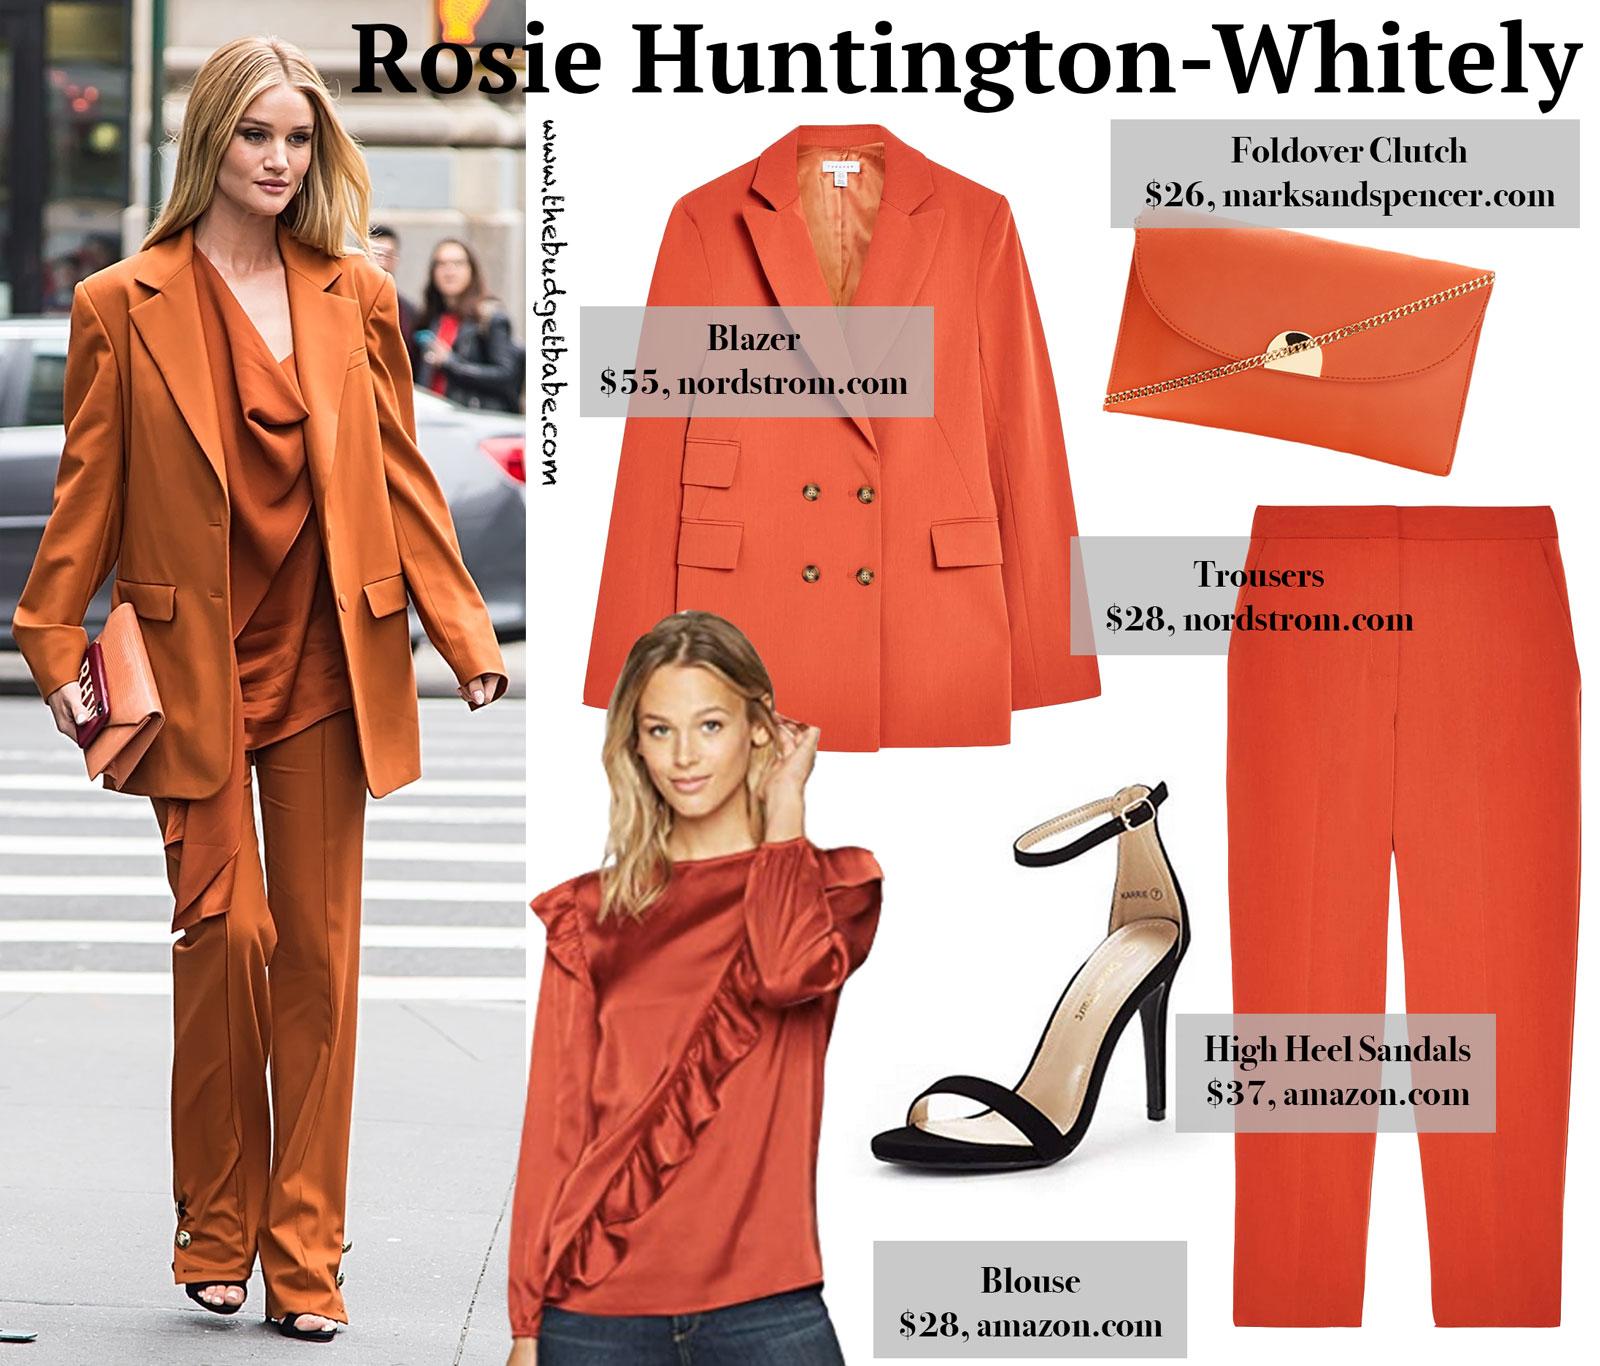 6cfc05551964f Rosie Huntington-Whitely Rust Orange Suit Look for Less